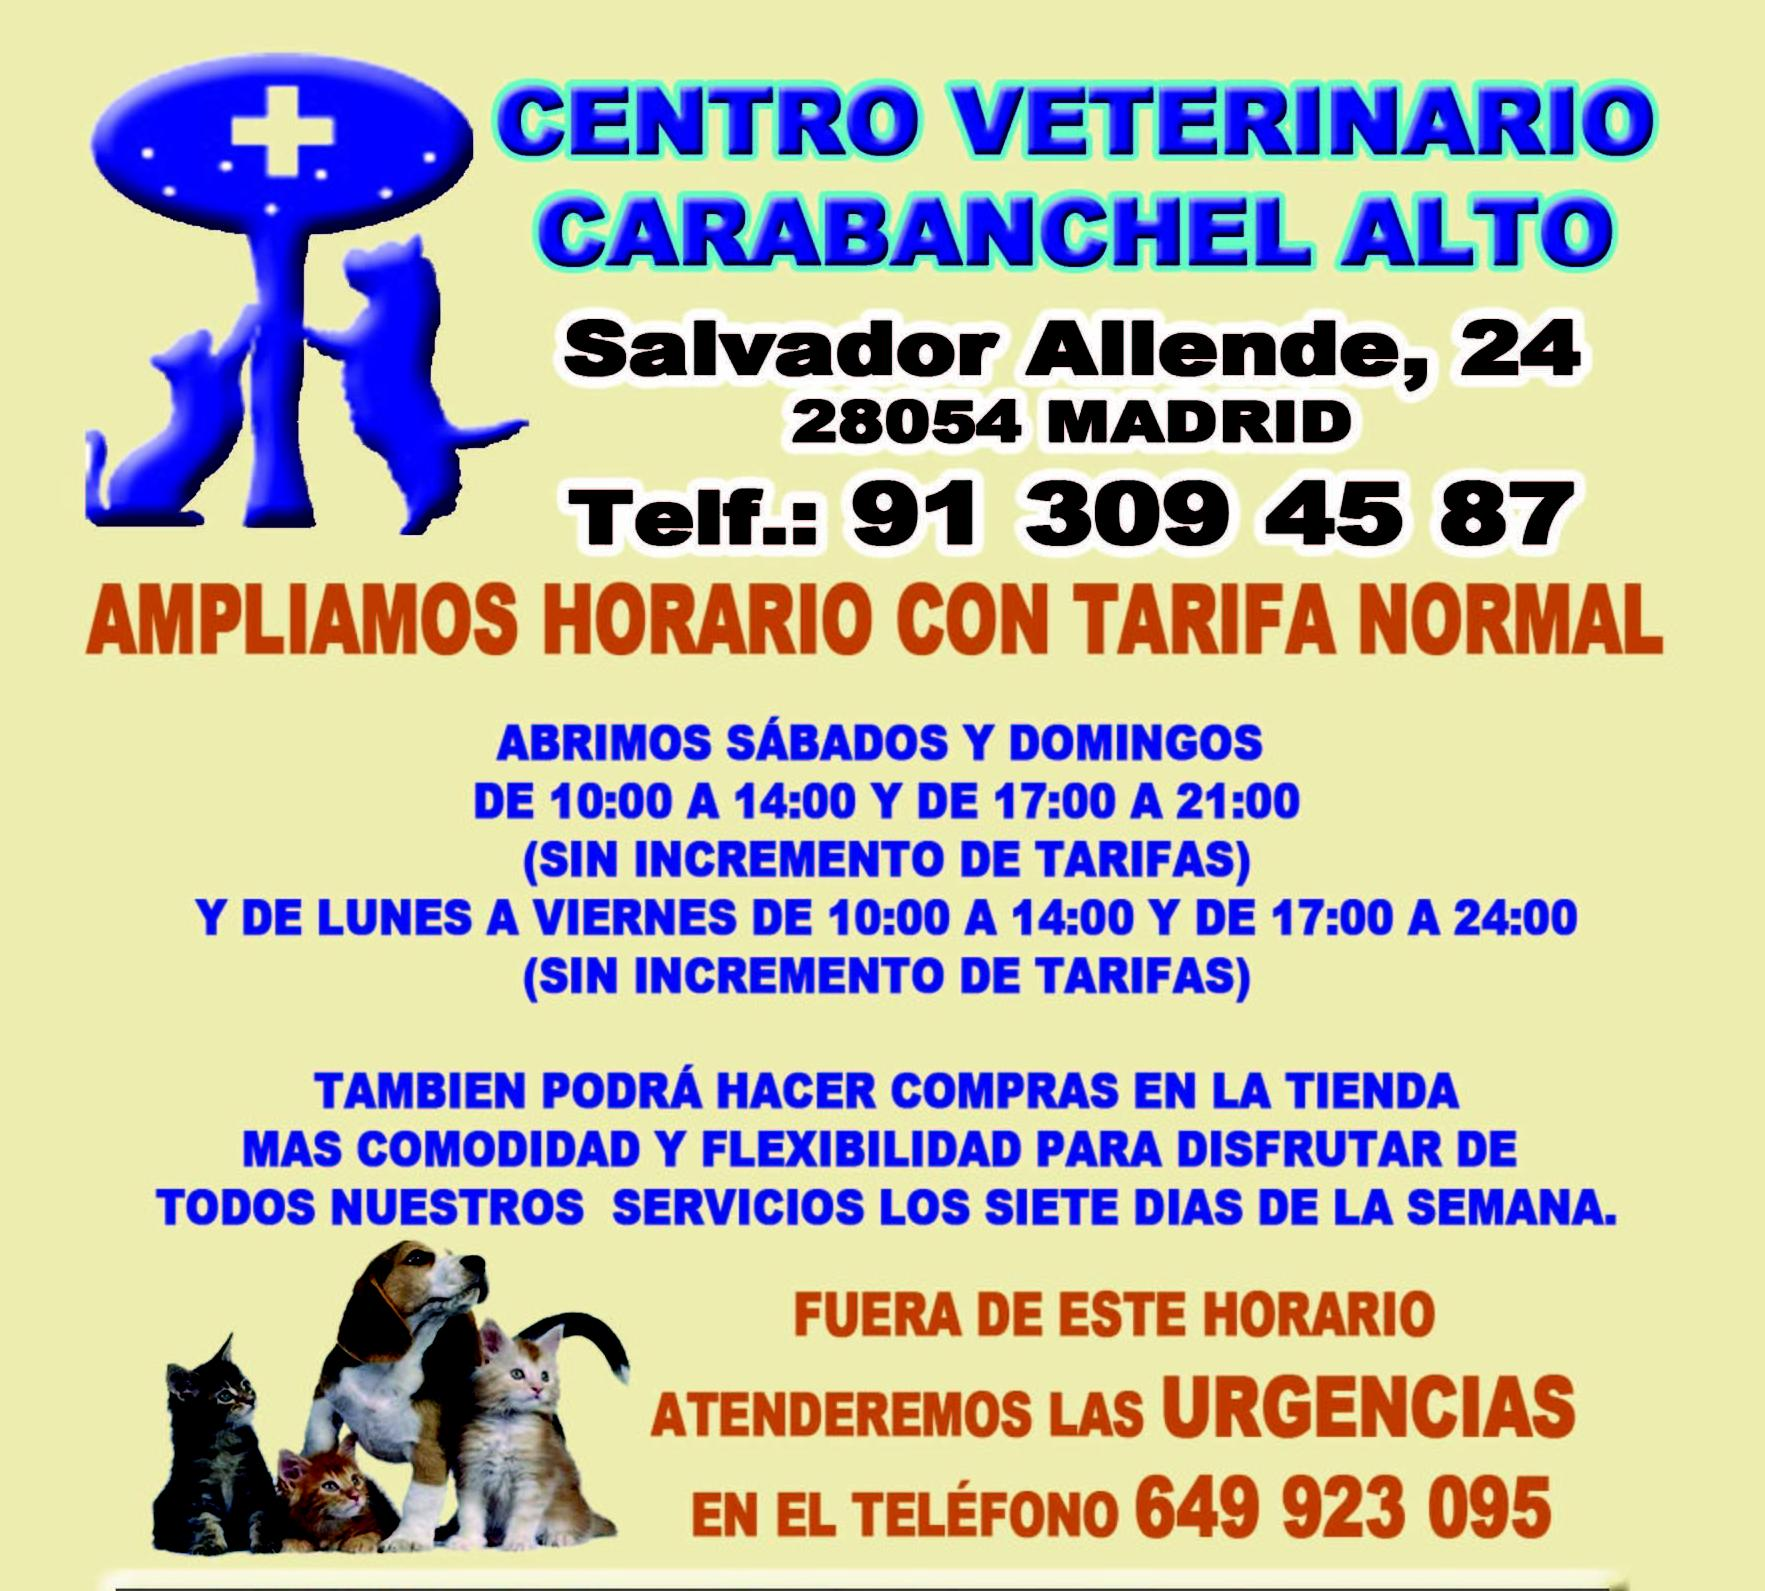 ATENCIÓN 24 HORAS: Especialidades de Centro Veterinario Carabanchel Alto